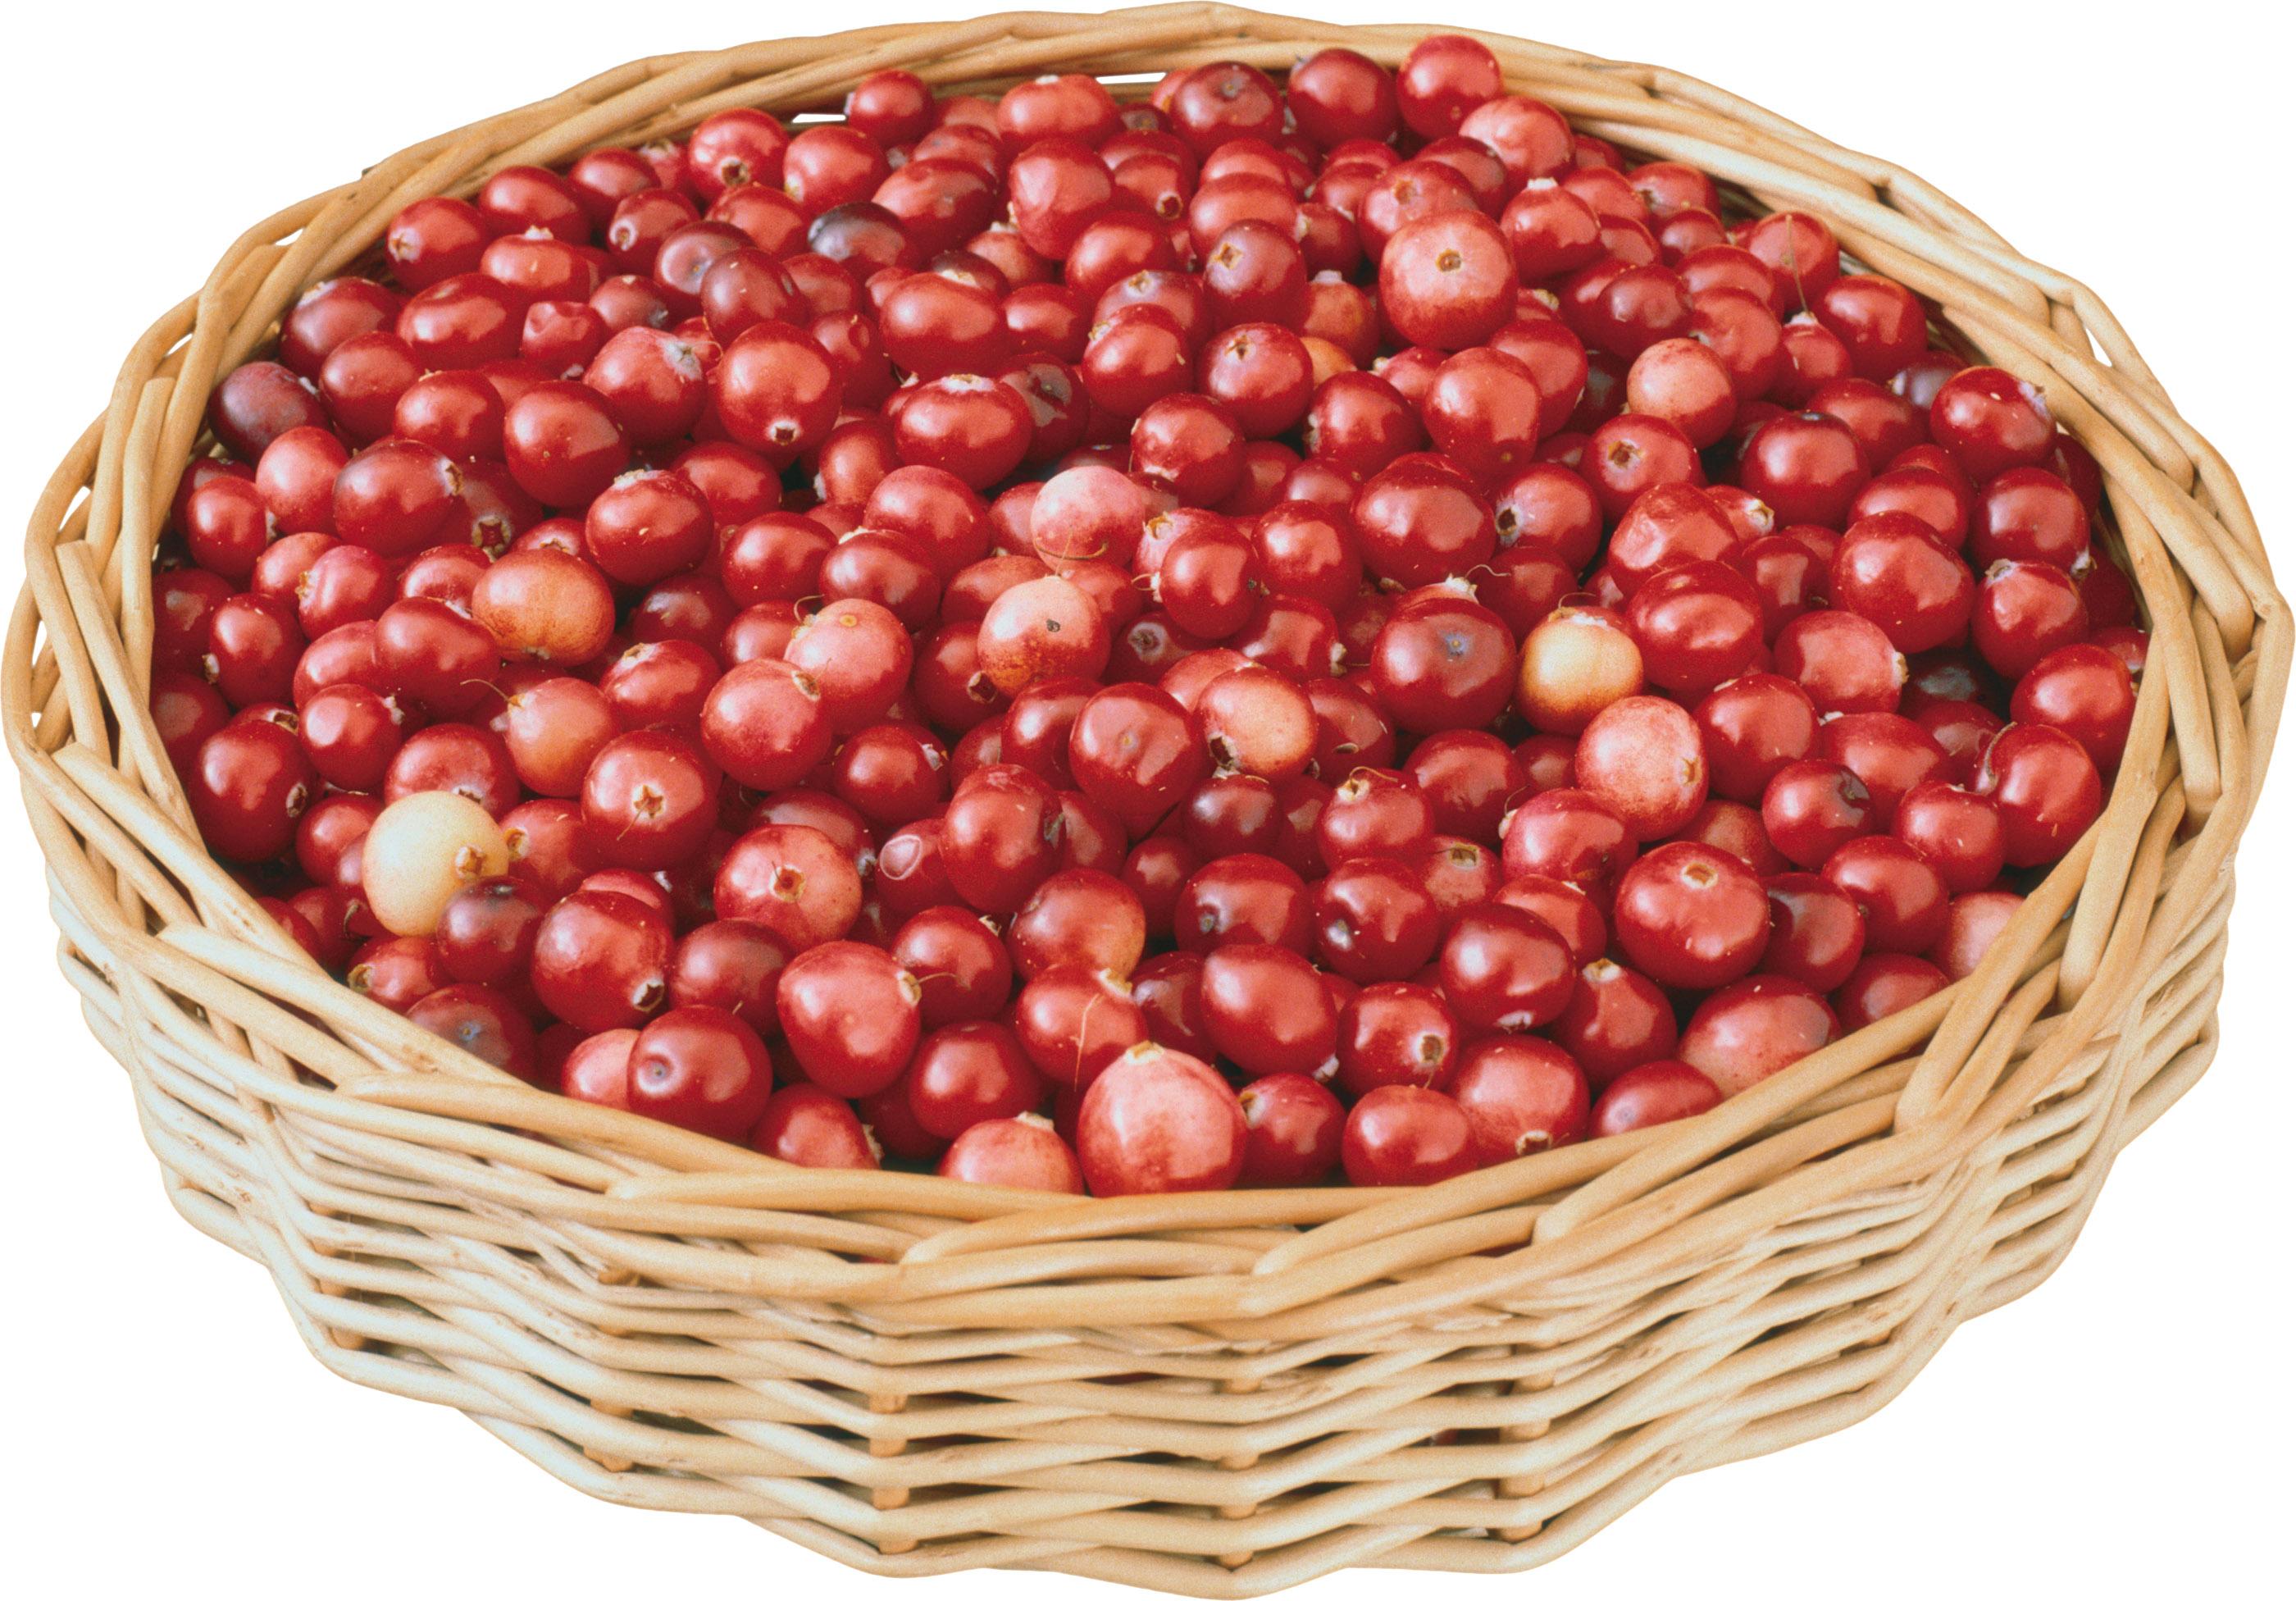 Фото 27: Корзина наполнена плодами боярышника